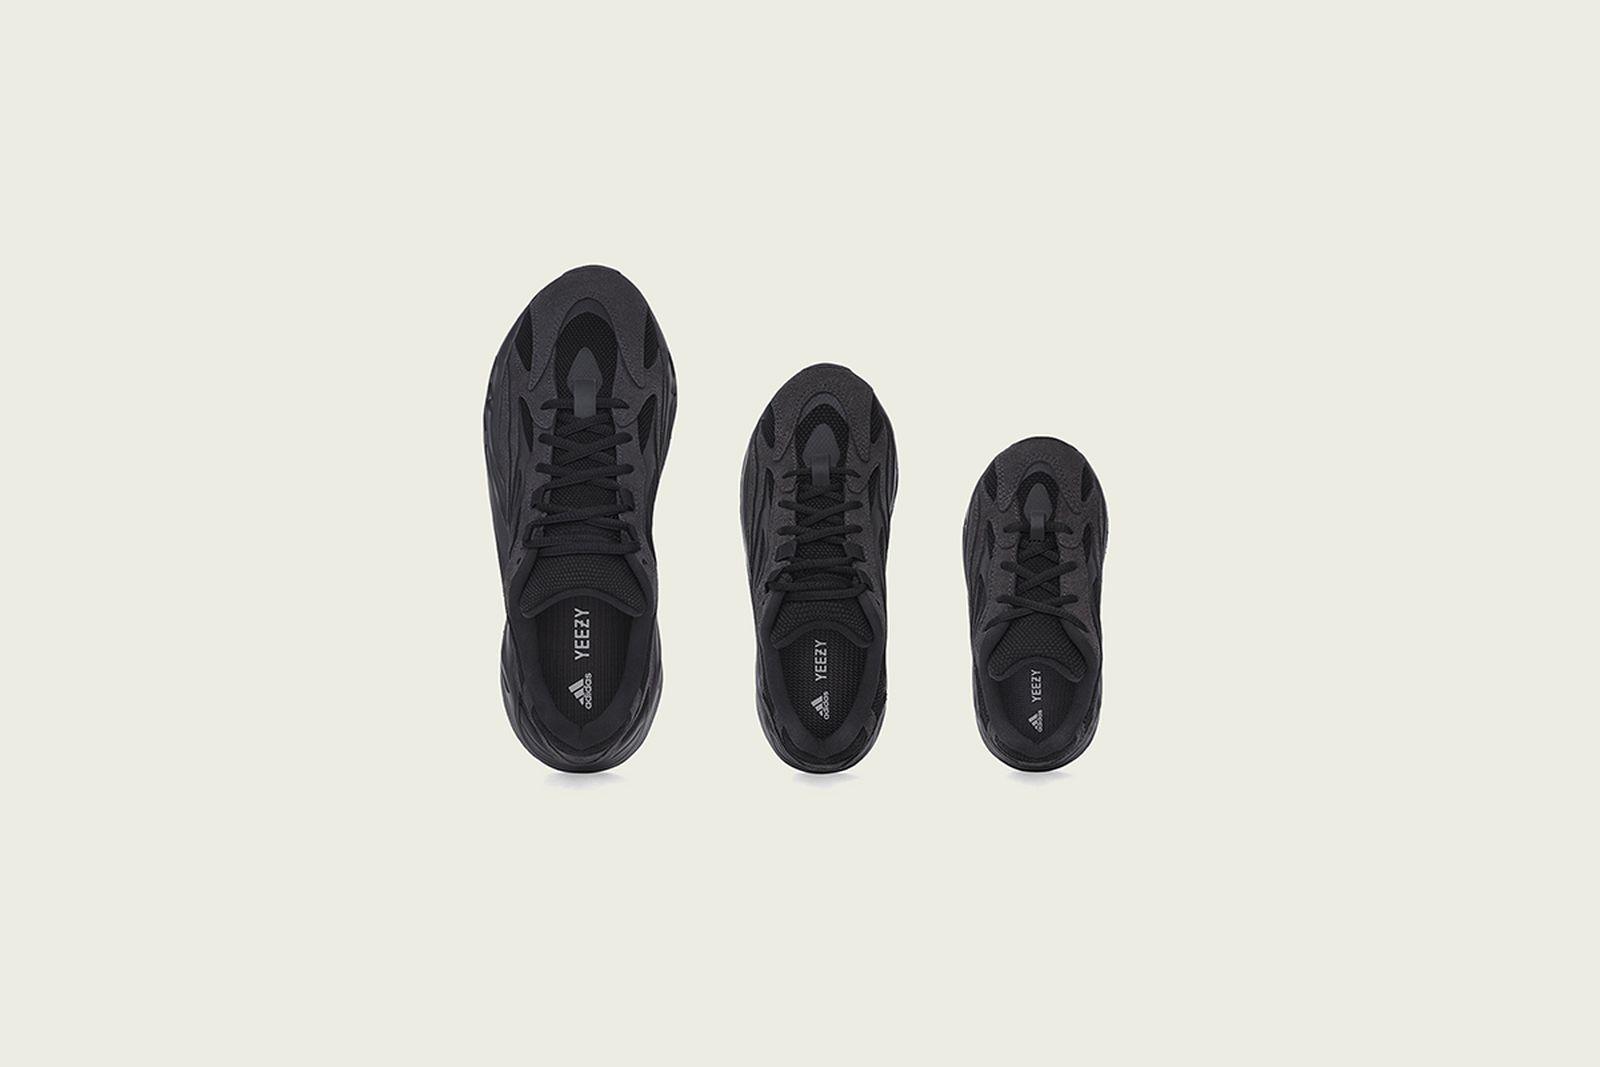 Adidas Yeezy Boost 700 V2 Vanta How To Buy Today